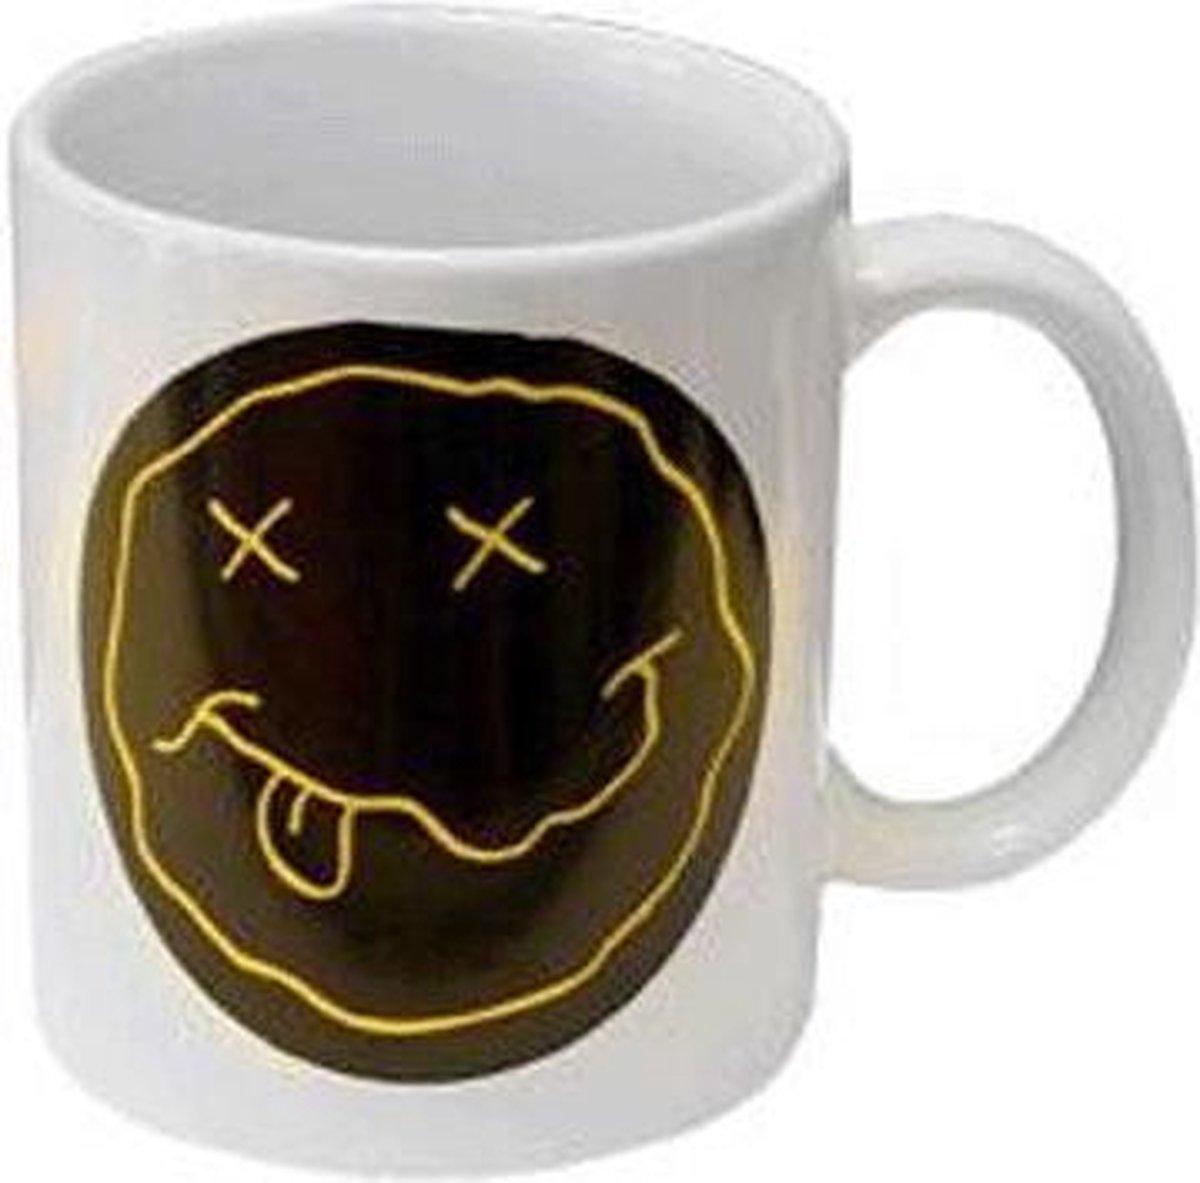 123 Kado koffiemokken